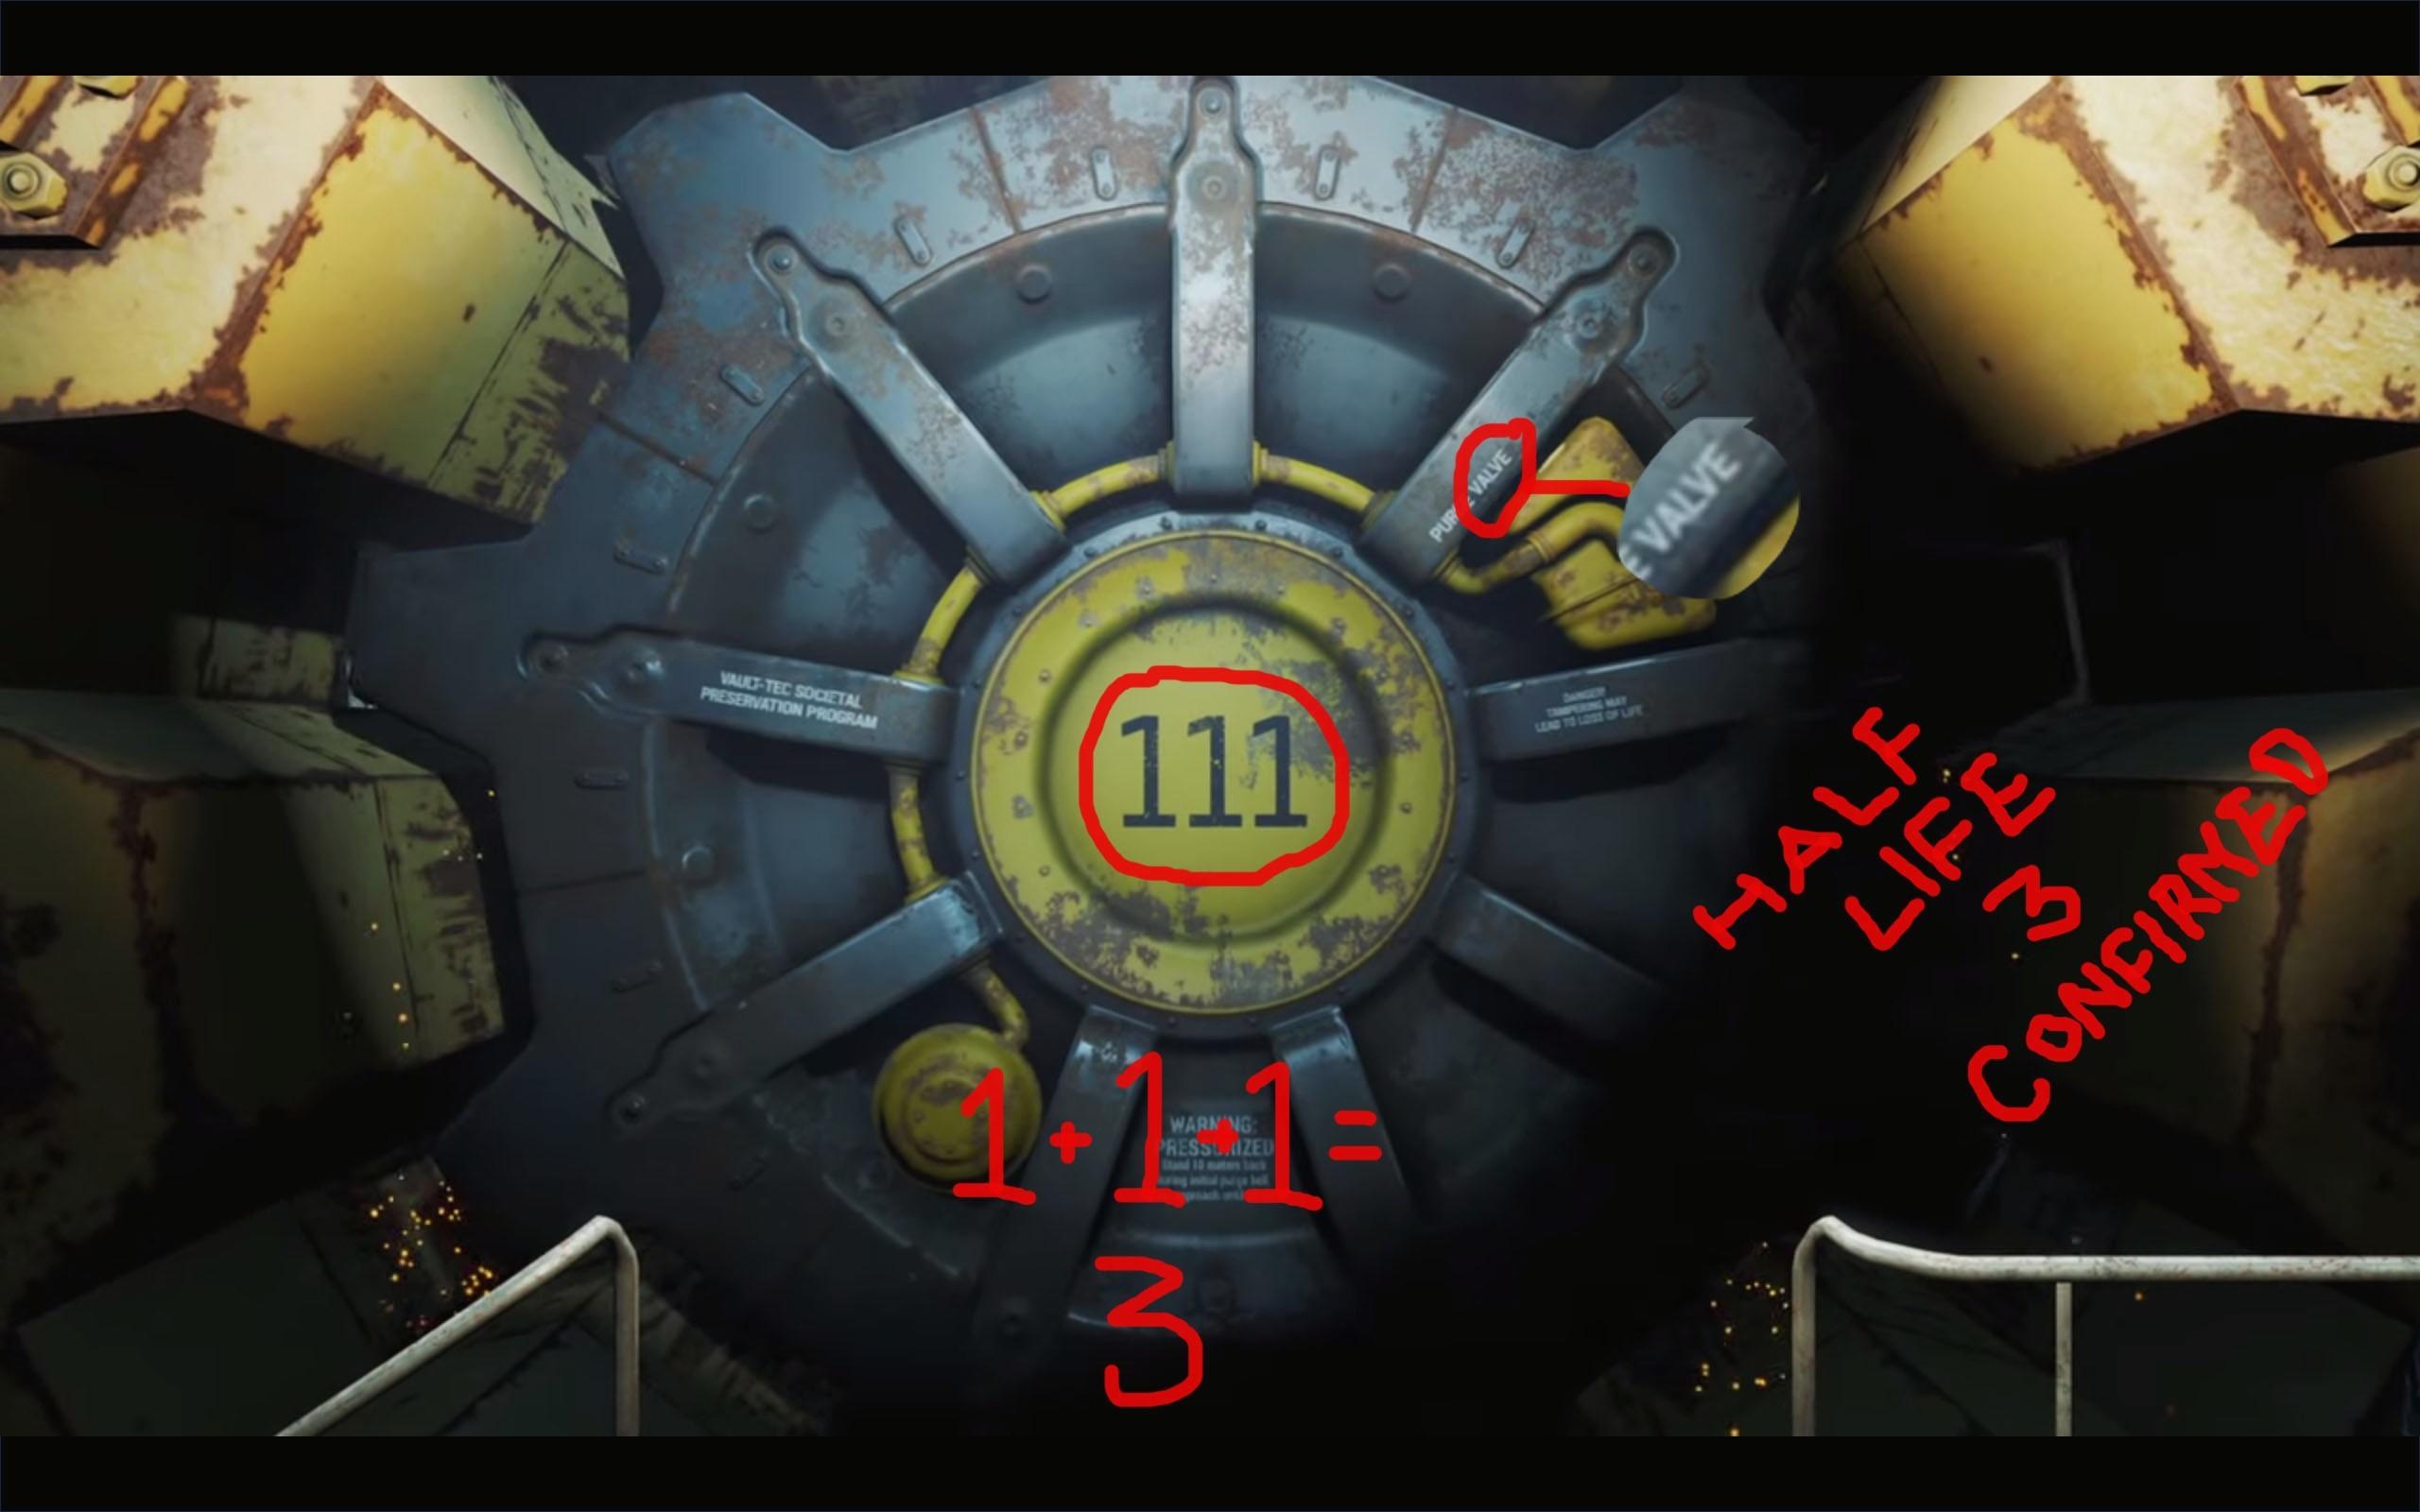 2560x1600 Fallout 4 image